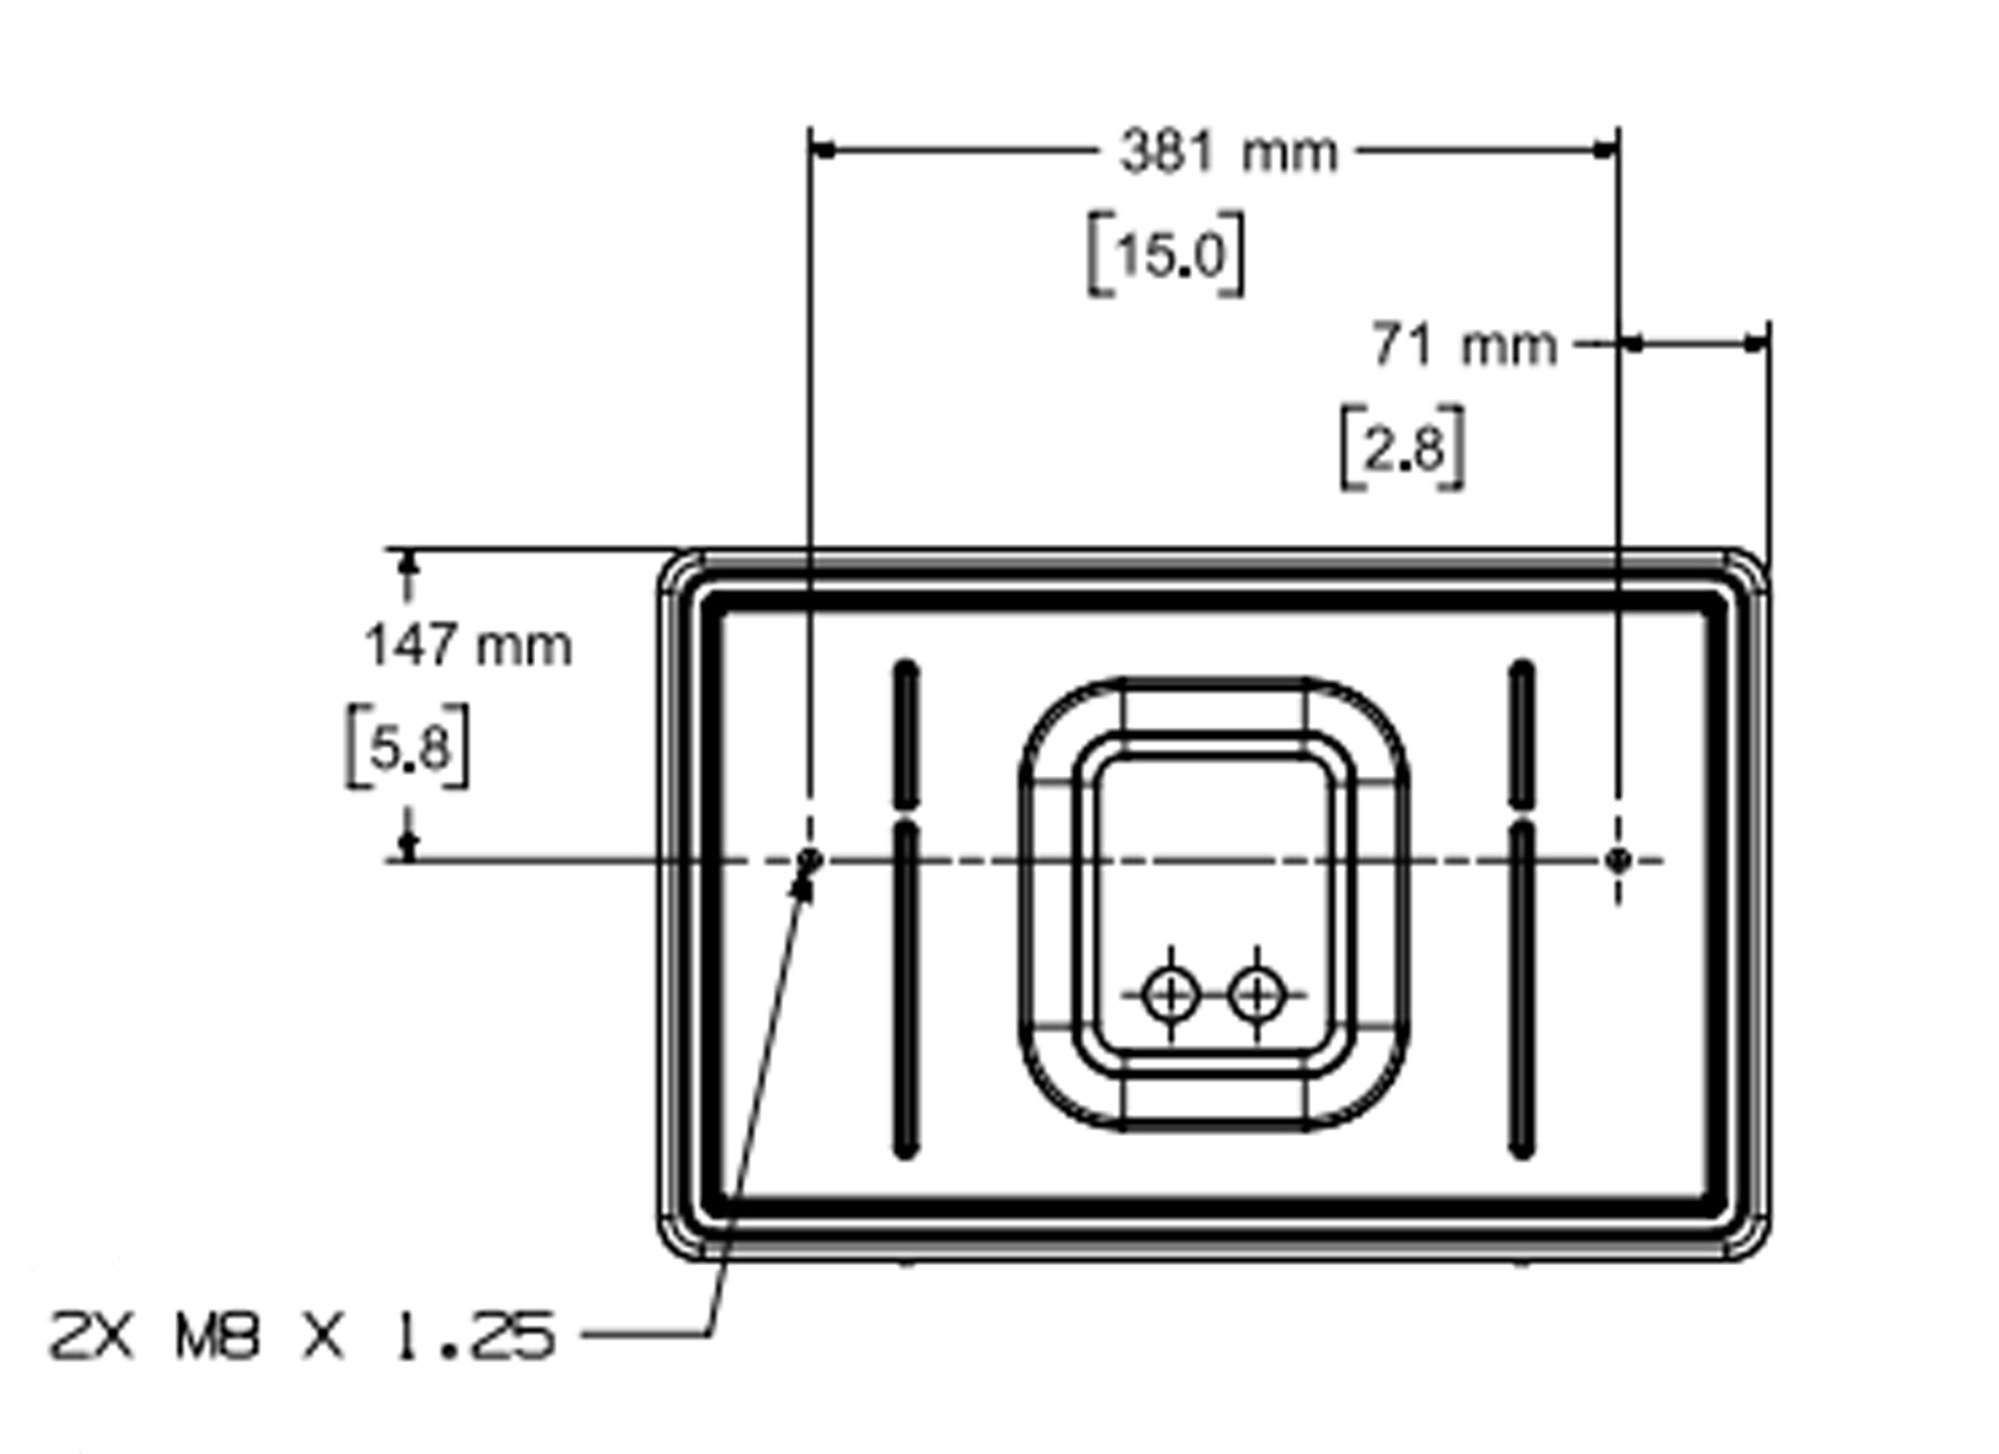 hight resolution of bose panaray 802 ii outdoor speaker black 3